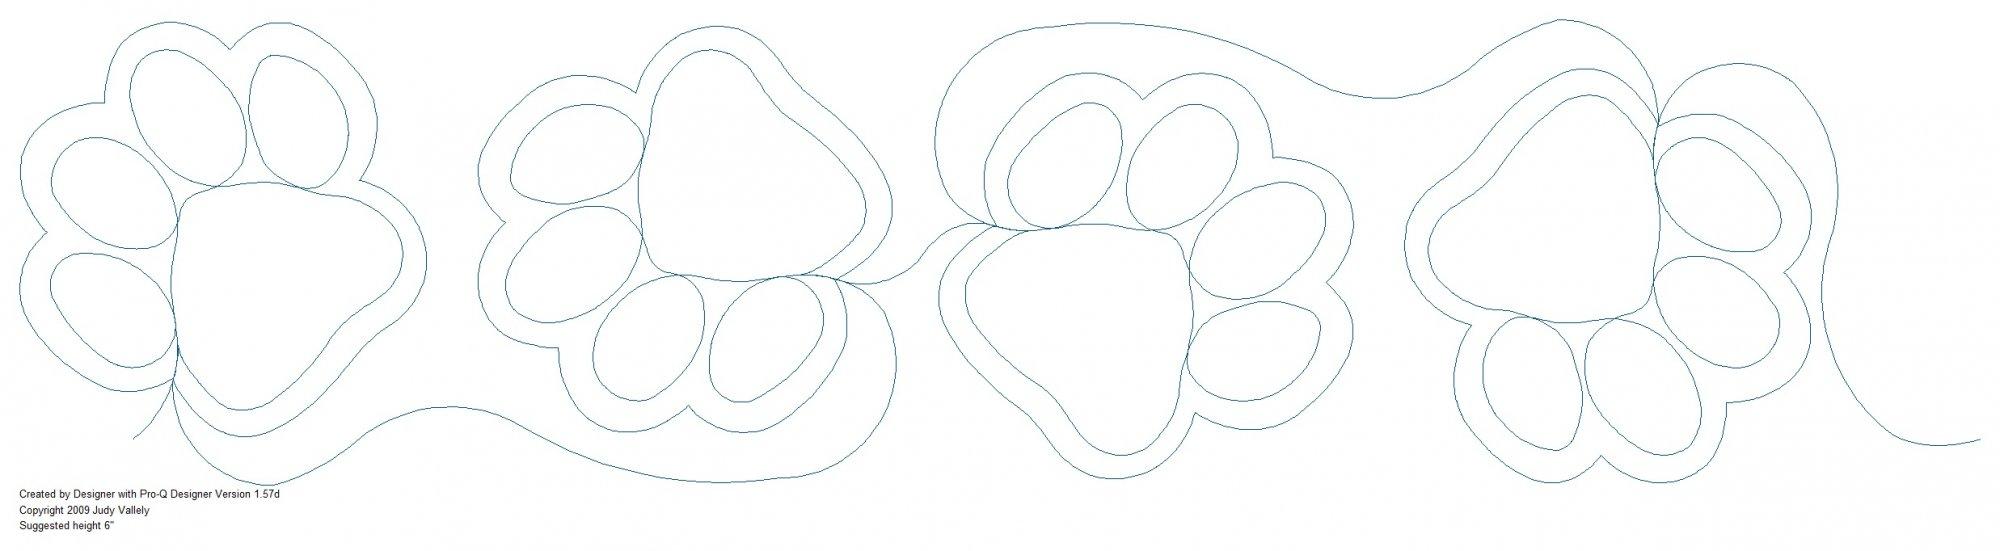 Design-Paw Prints